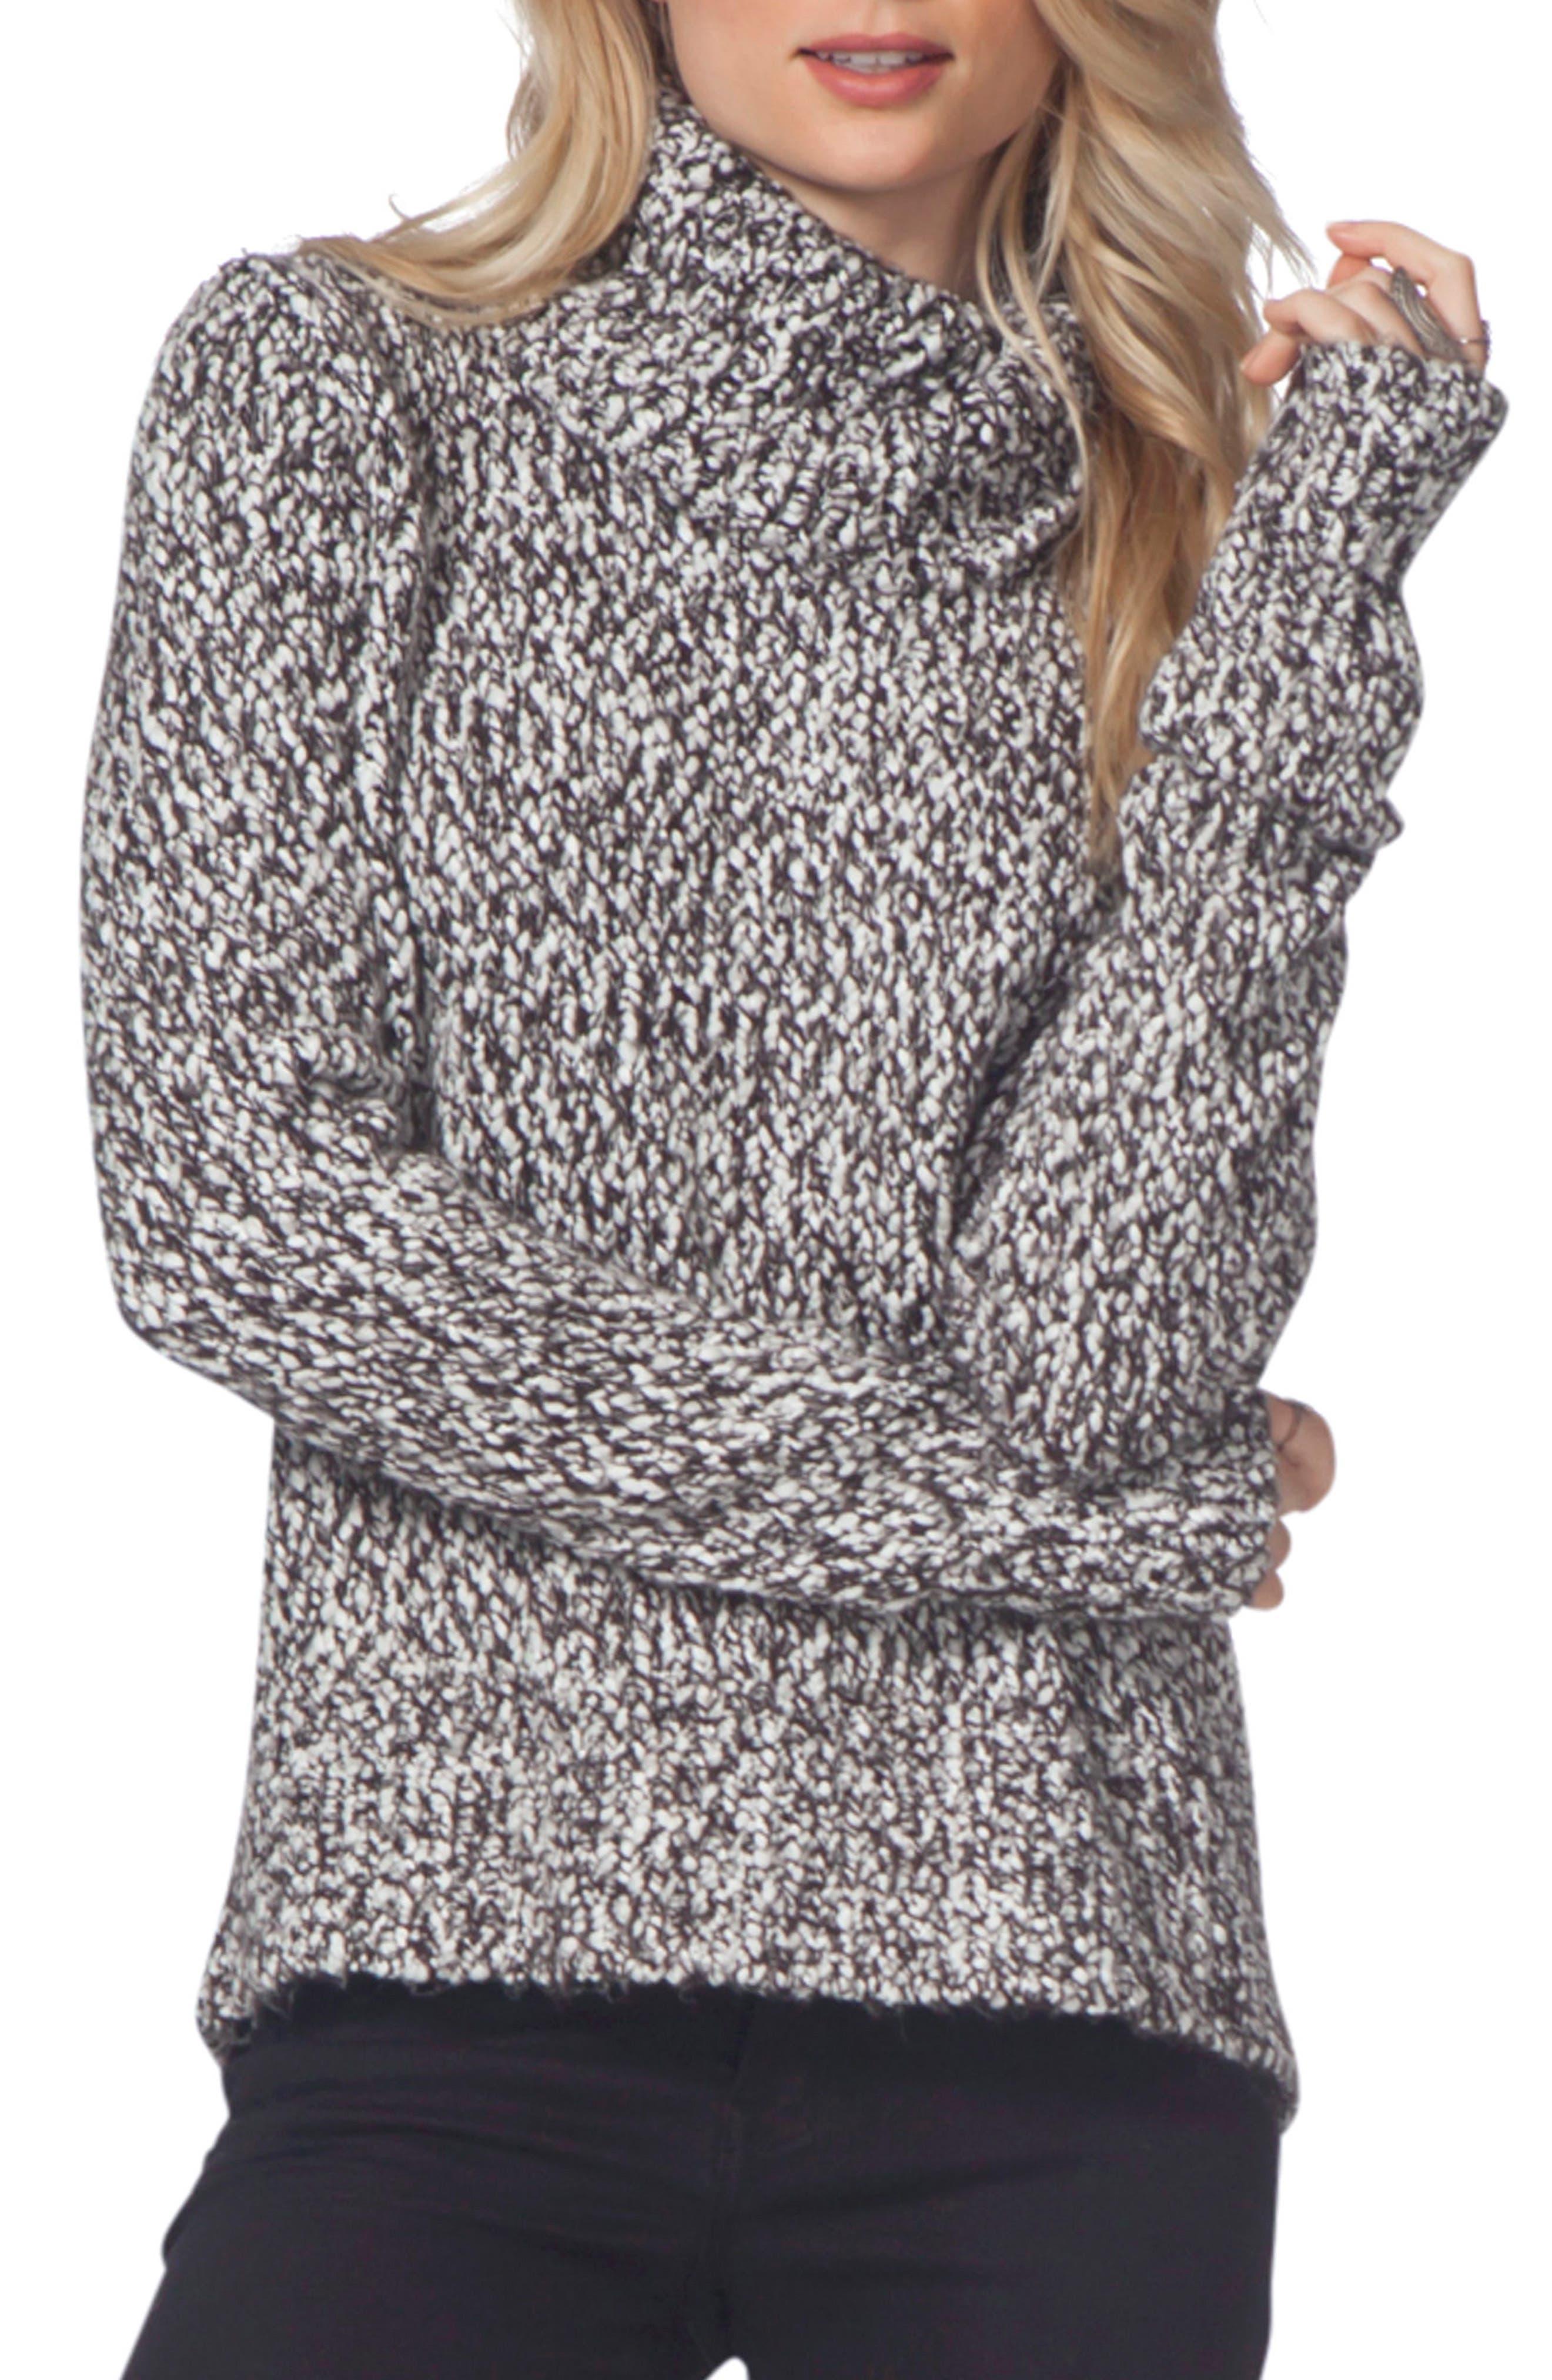 Sailor Turtleneck Sweater,                         Main,                         color, Black/ White